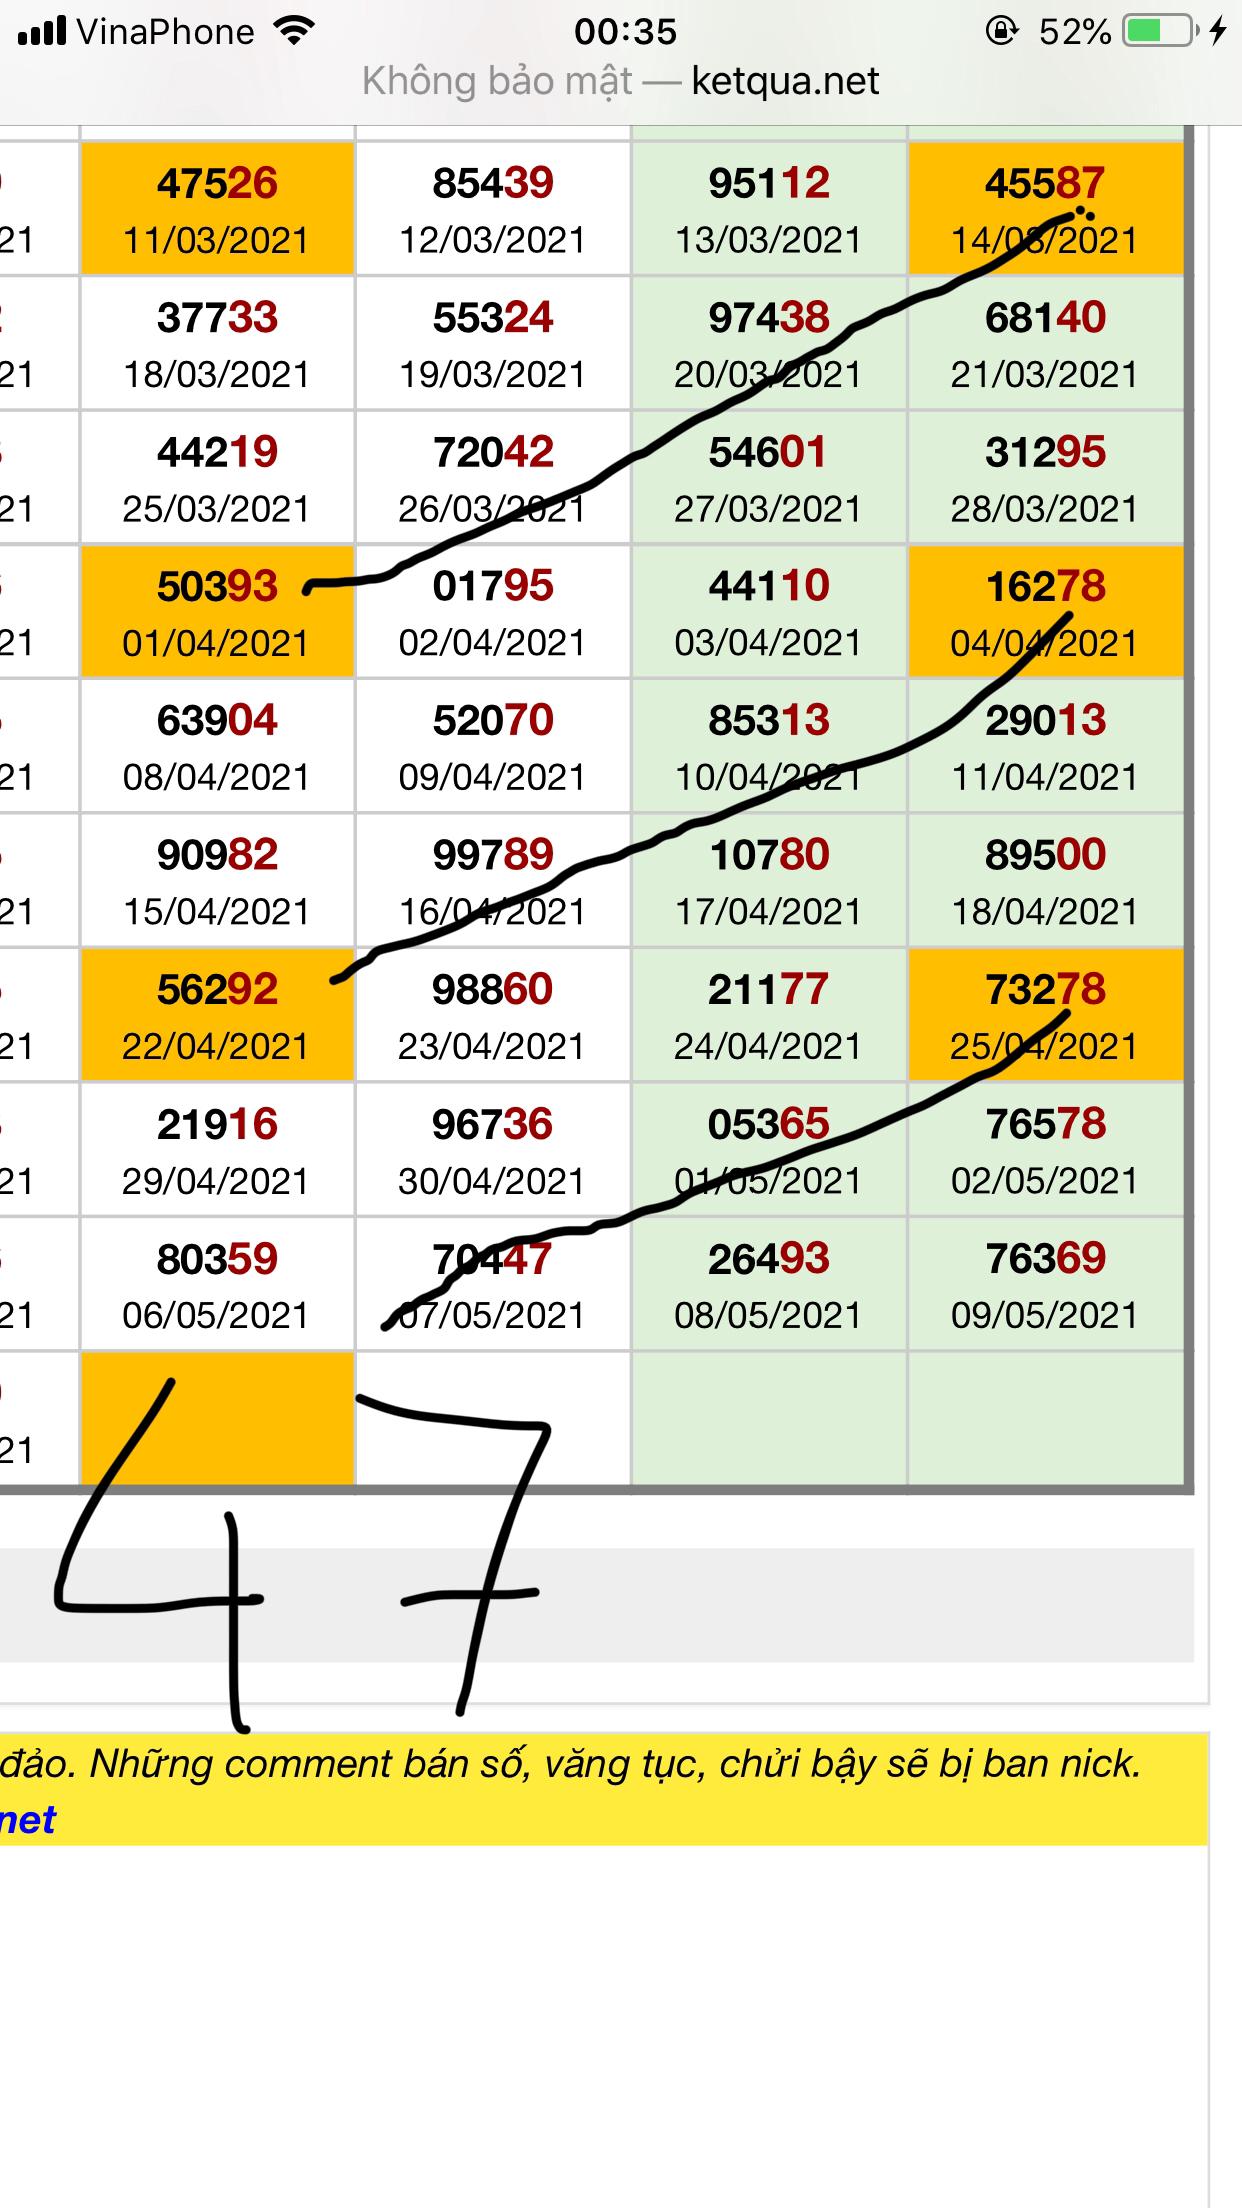 C635A037-C2A6-4F19-B382-63C8FAE7161A.png